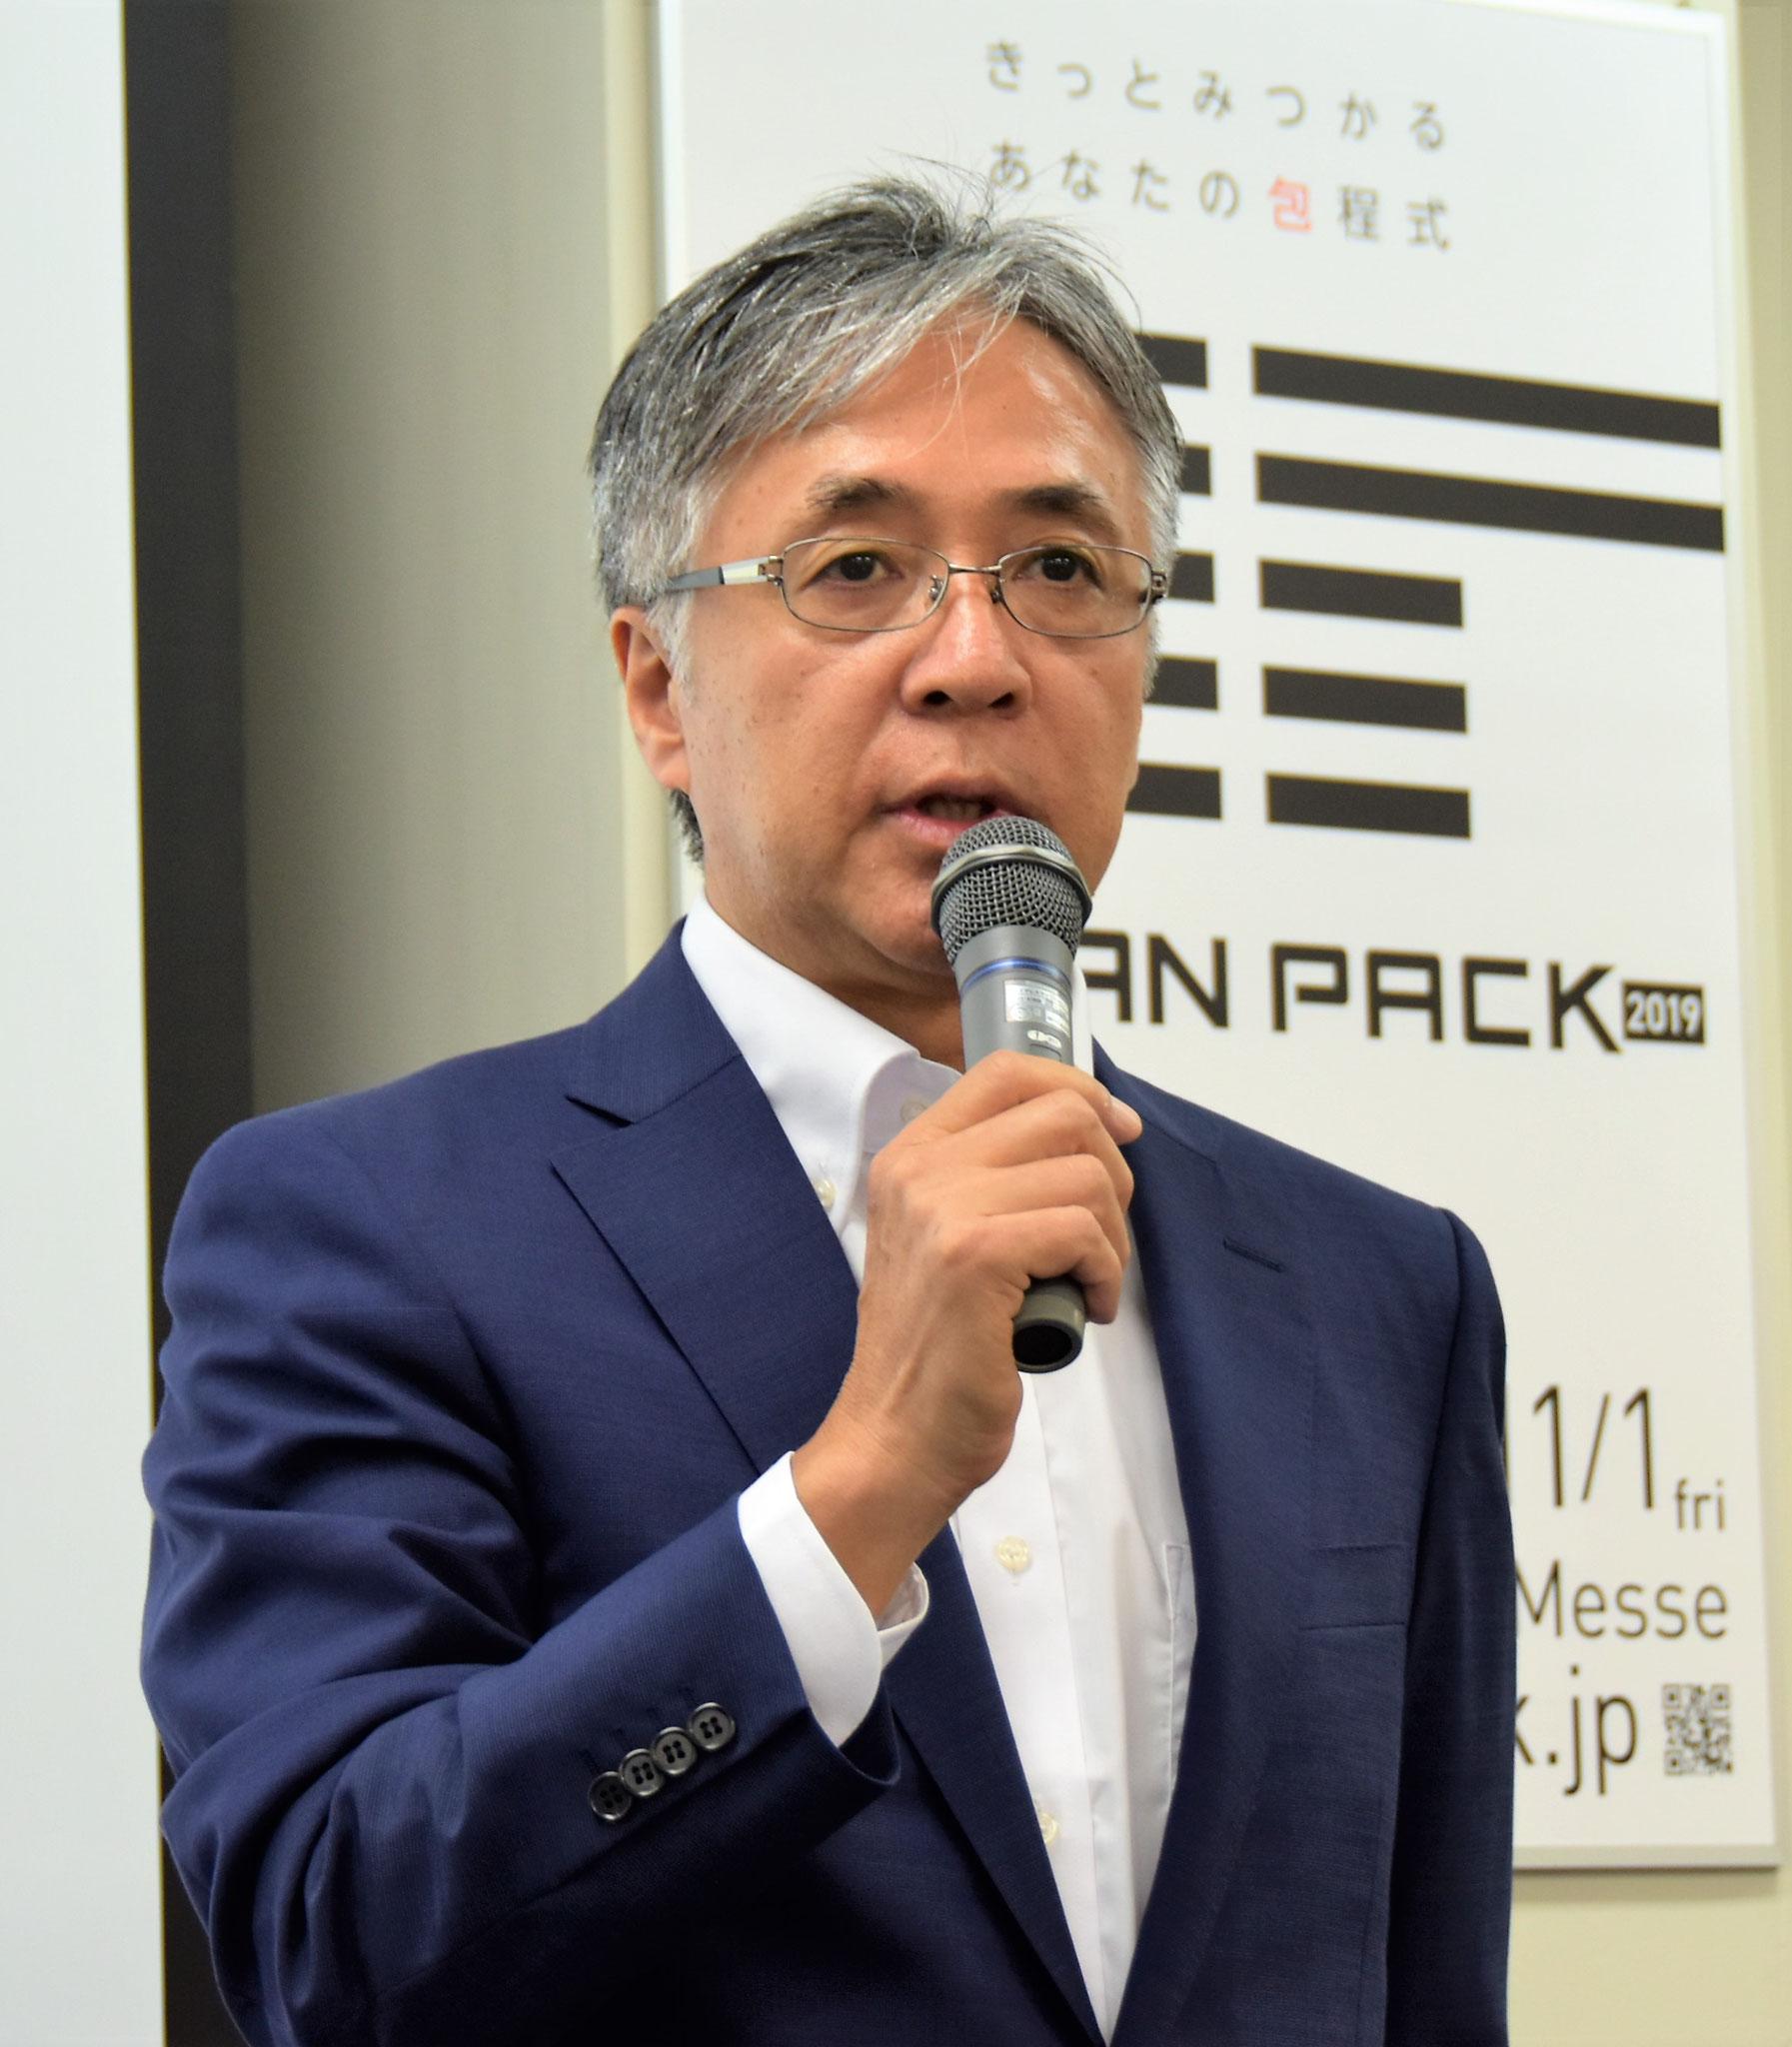 JAPAN PACK 2019について説明する金澤信・専務理事